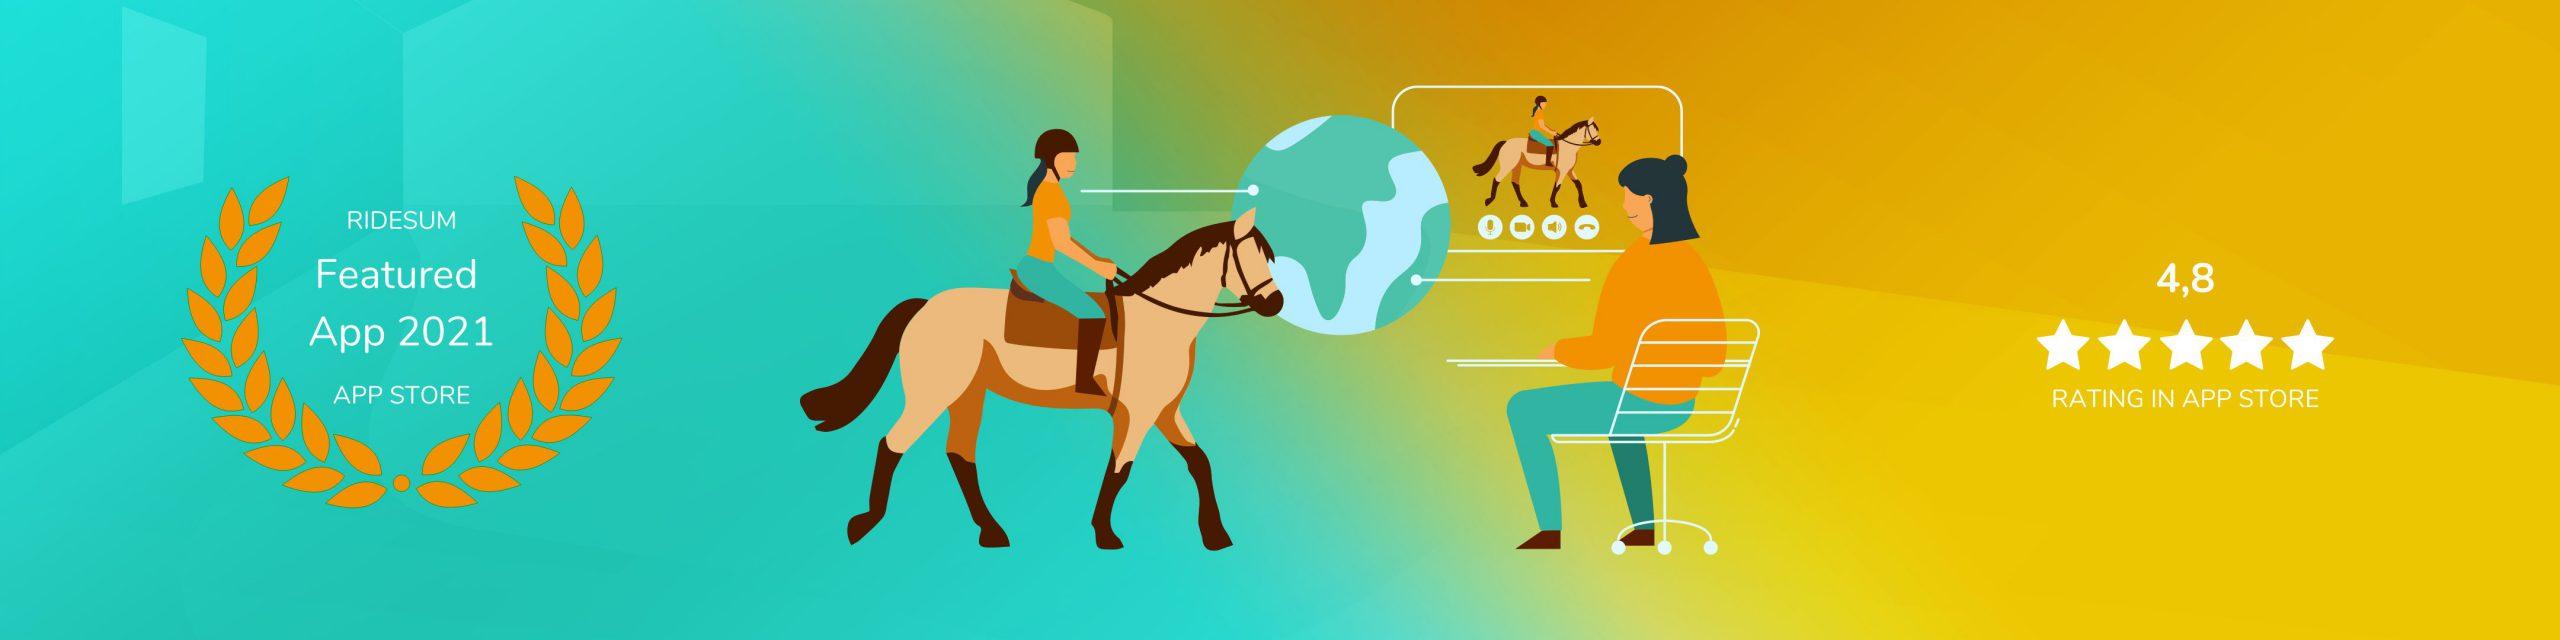 Image: Ridesum Rating in App Store 2021